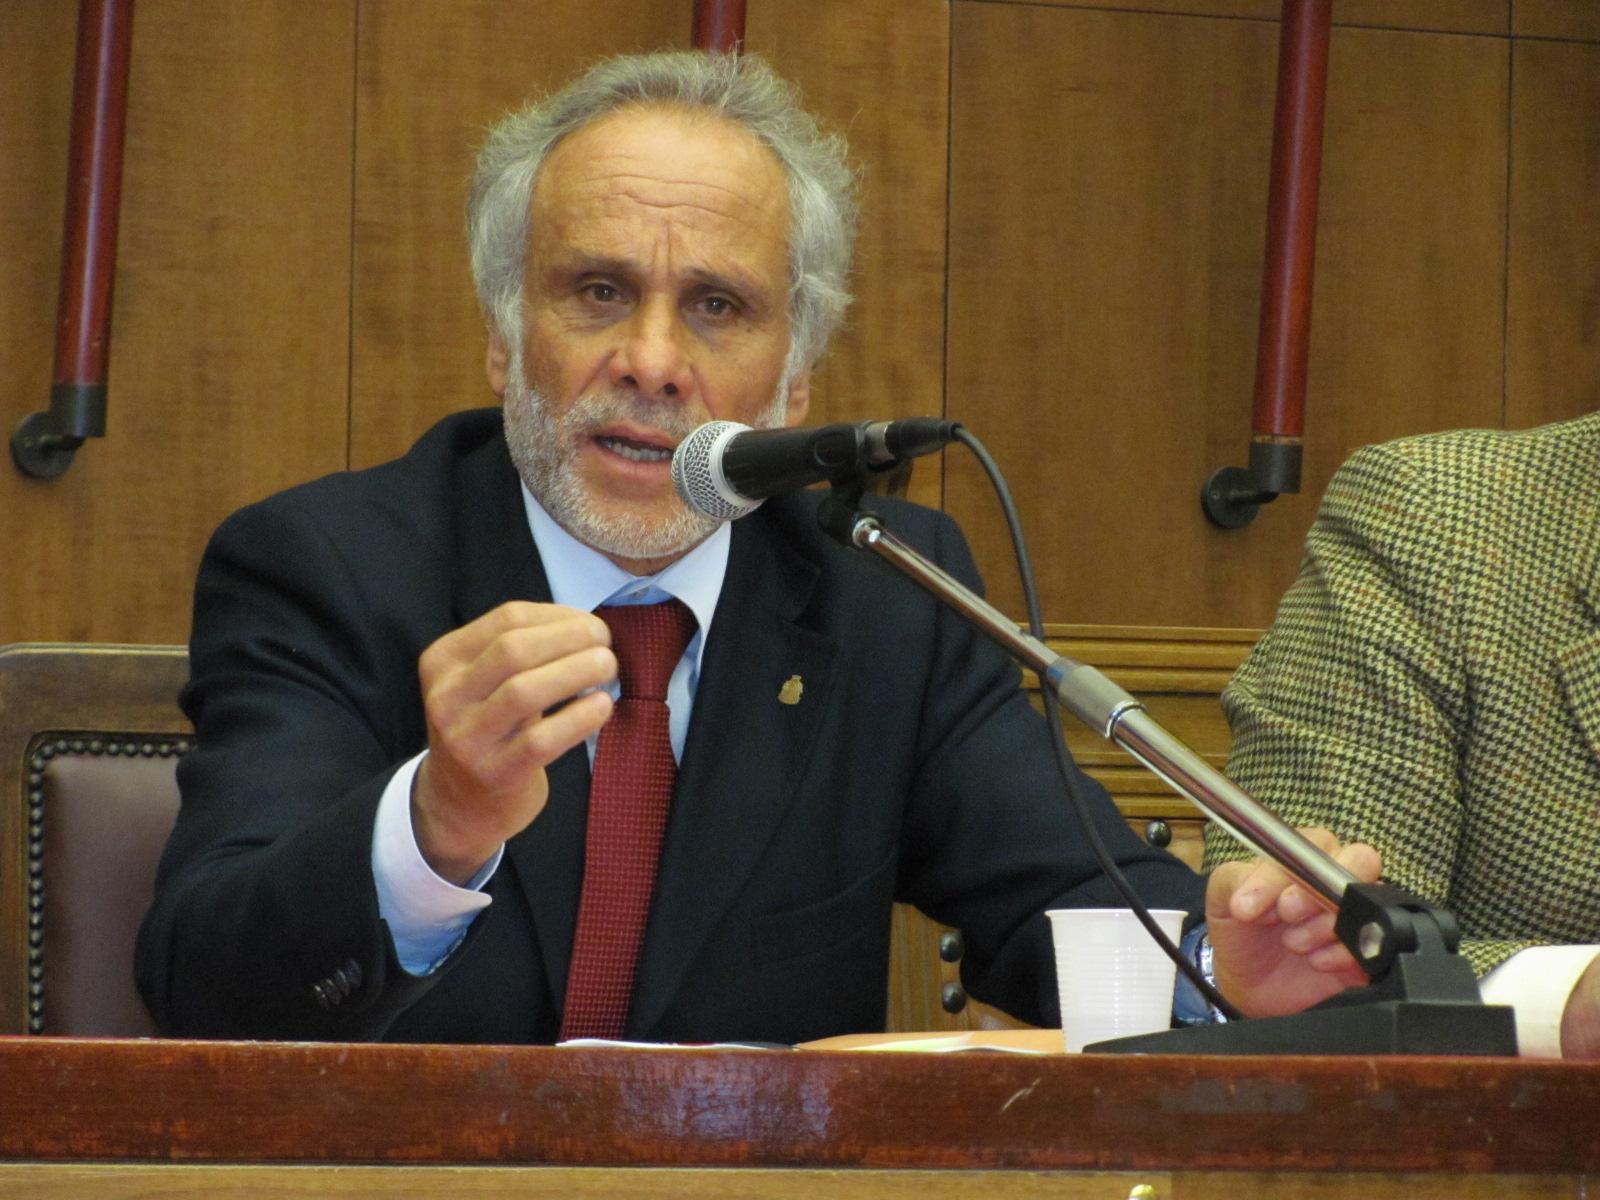 Sebastiano Pino